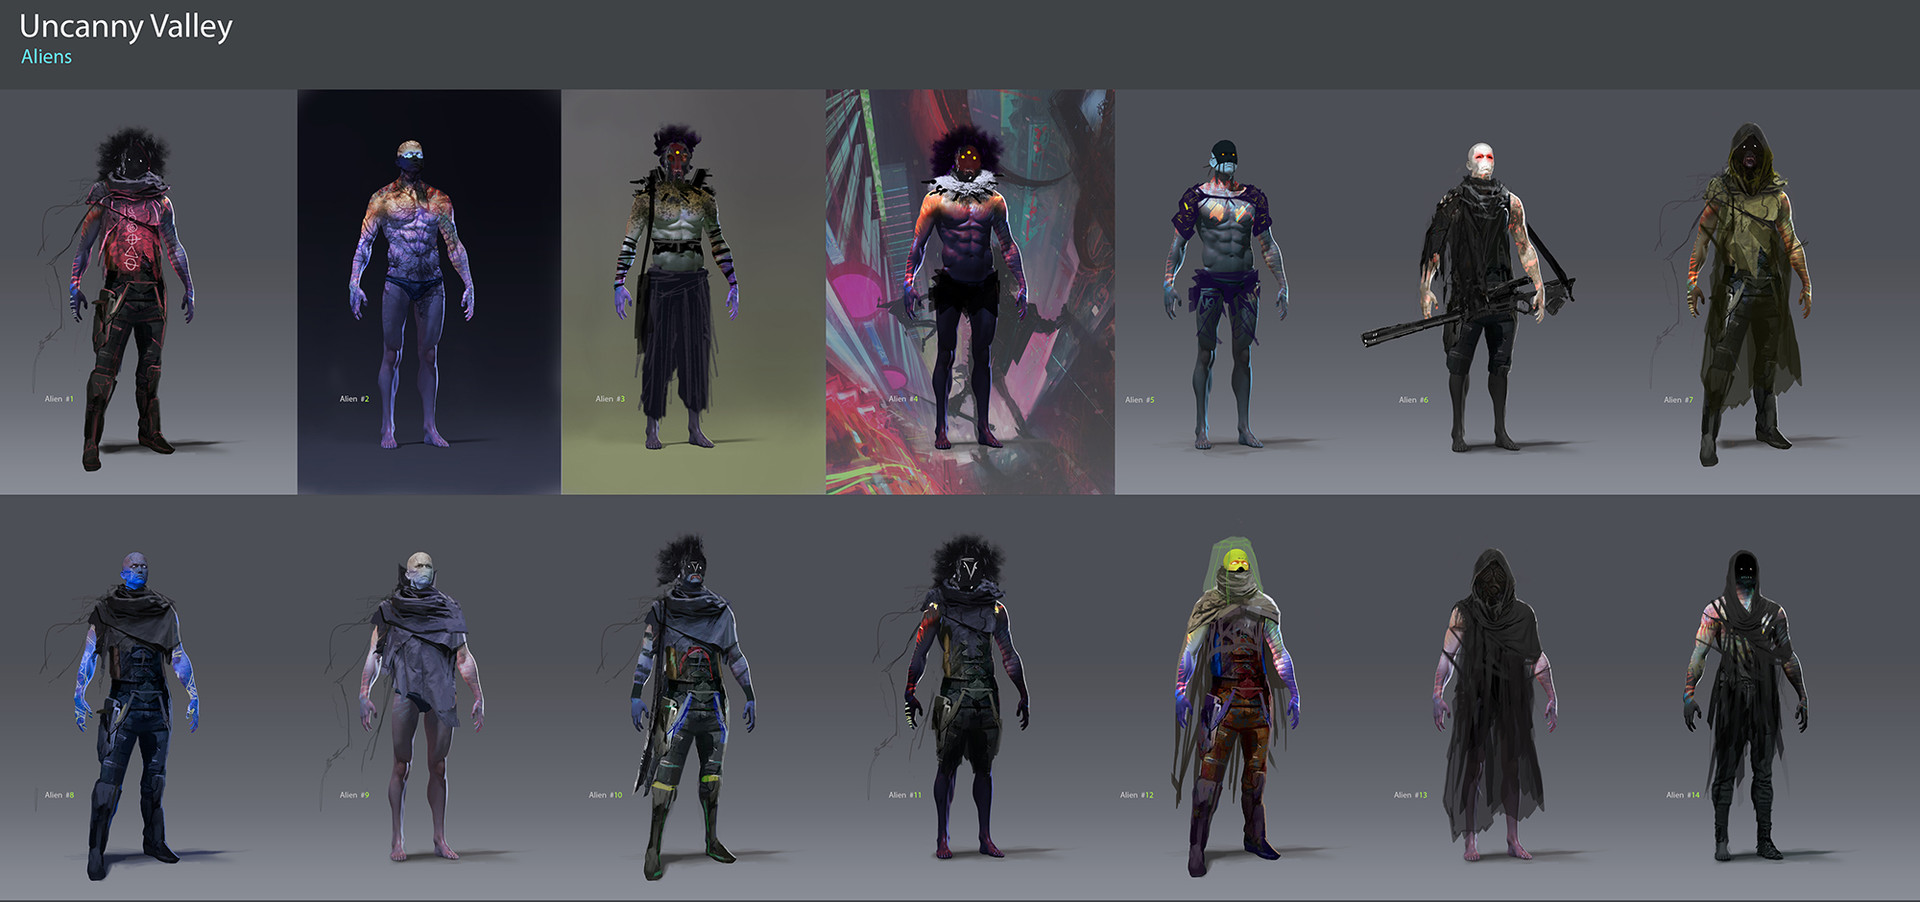 Pablo olivera uncanny valley character design aliens 15 baja